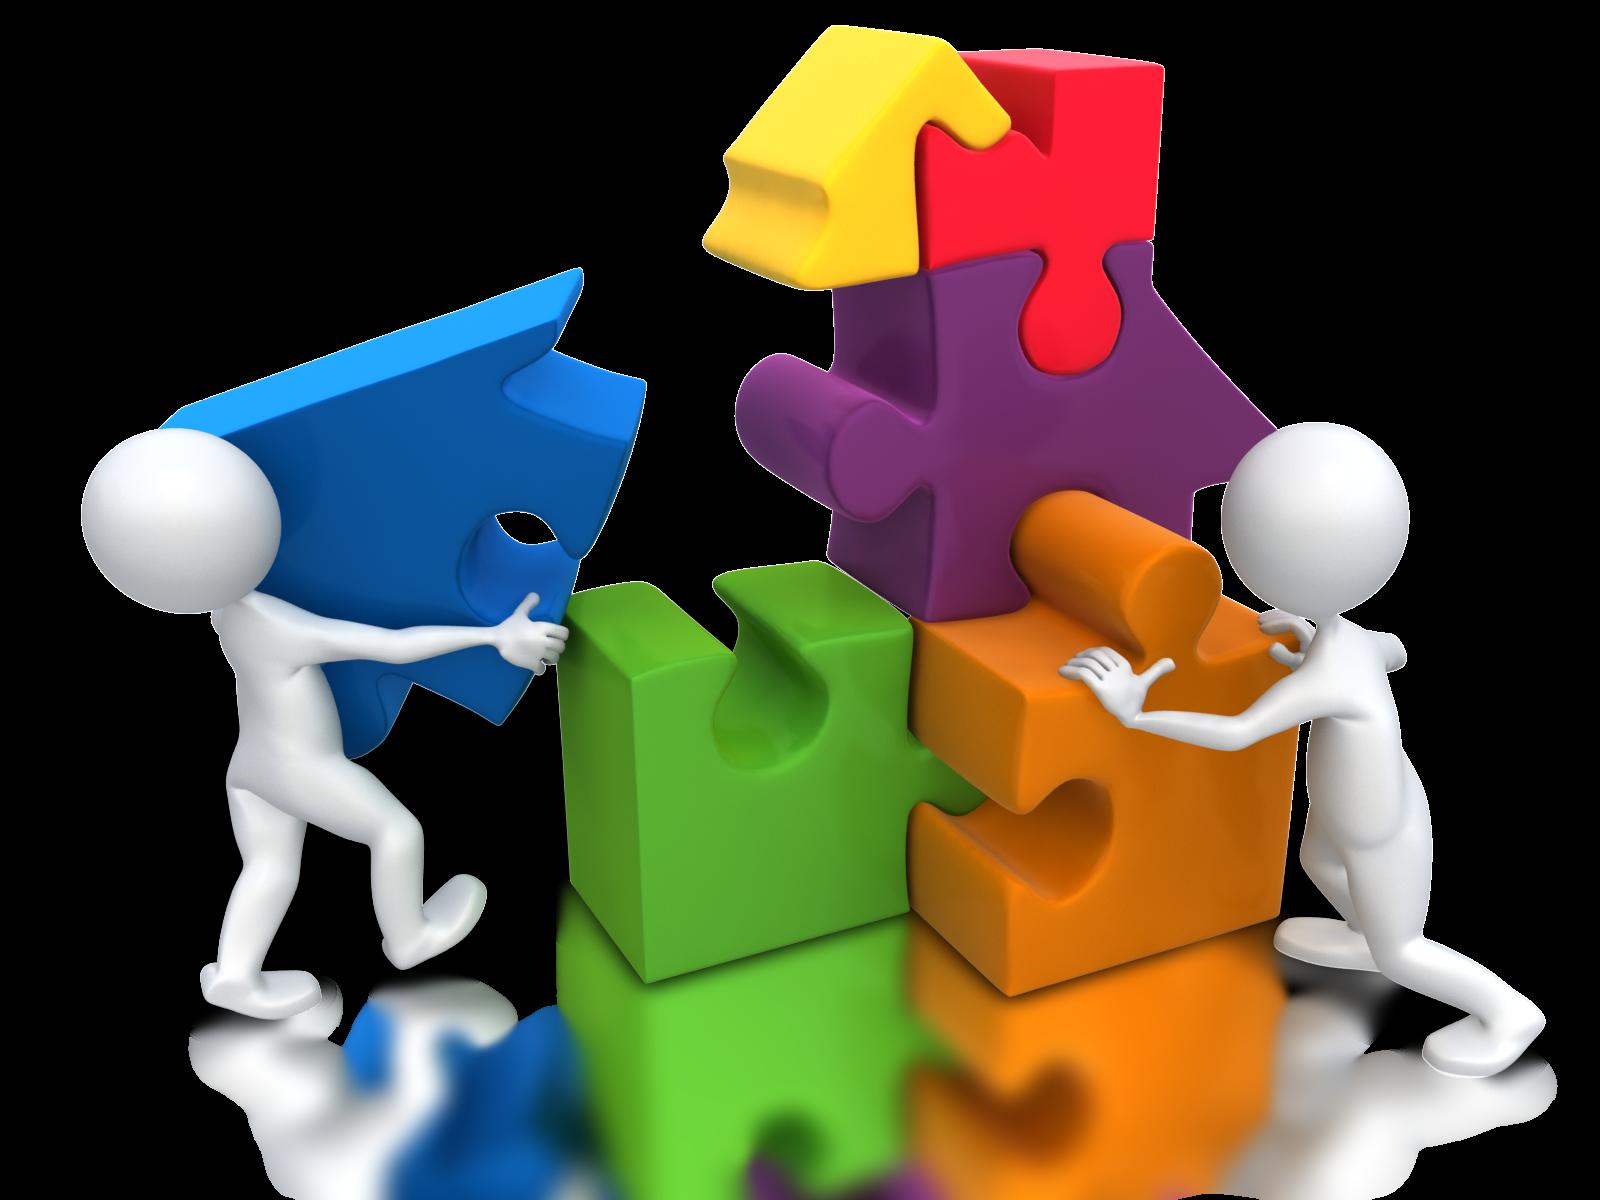 Planner clipart individual development plan. Http programmedevelopment com public